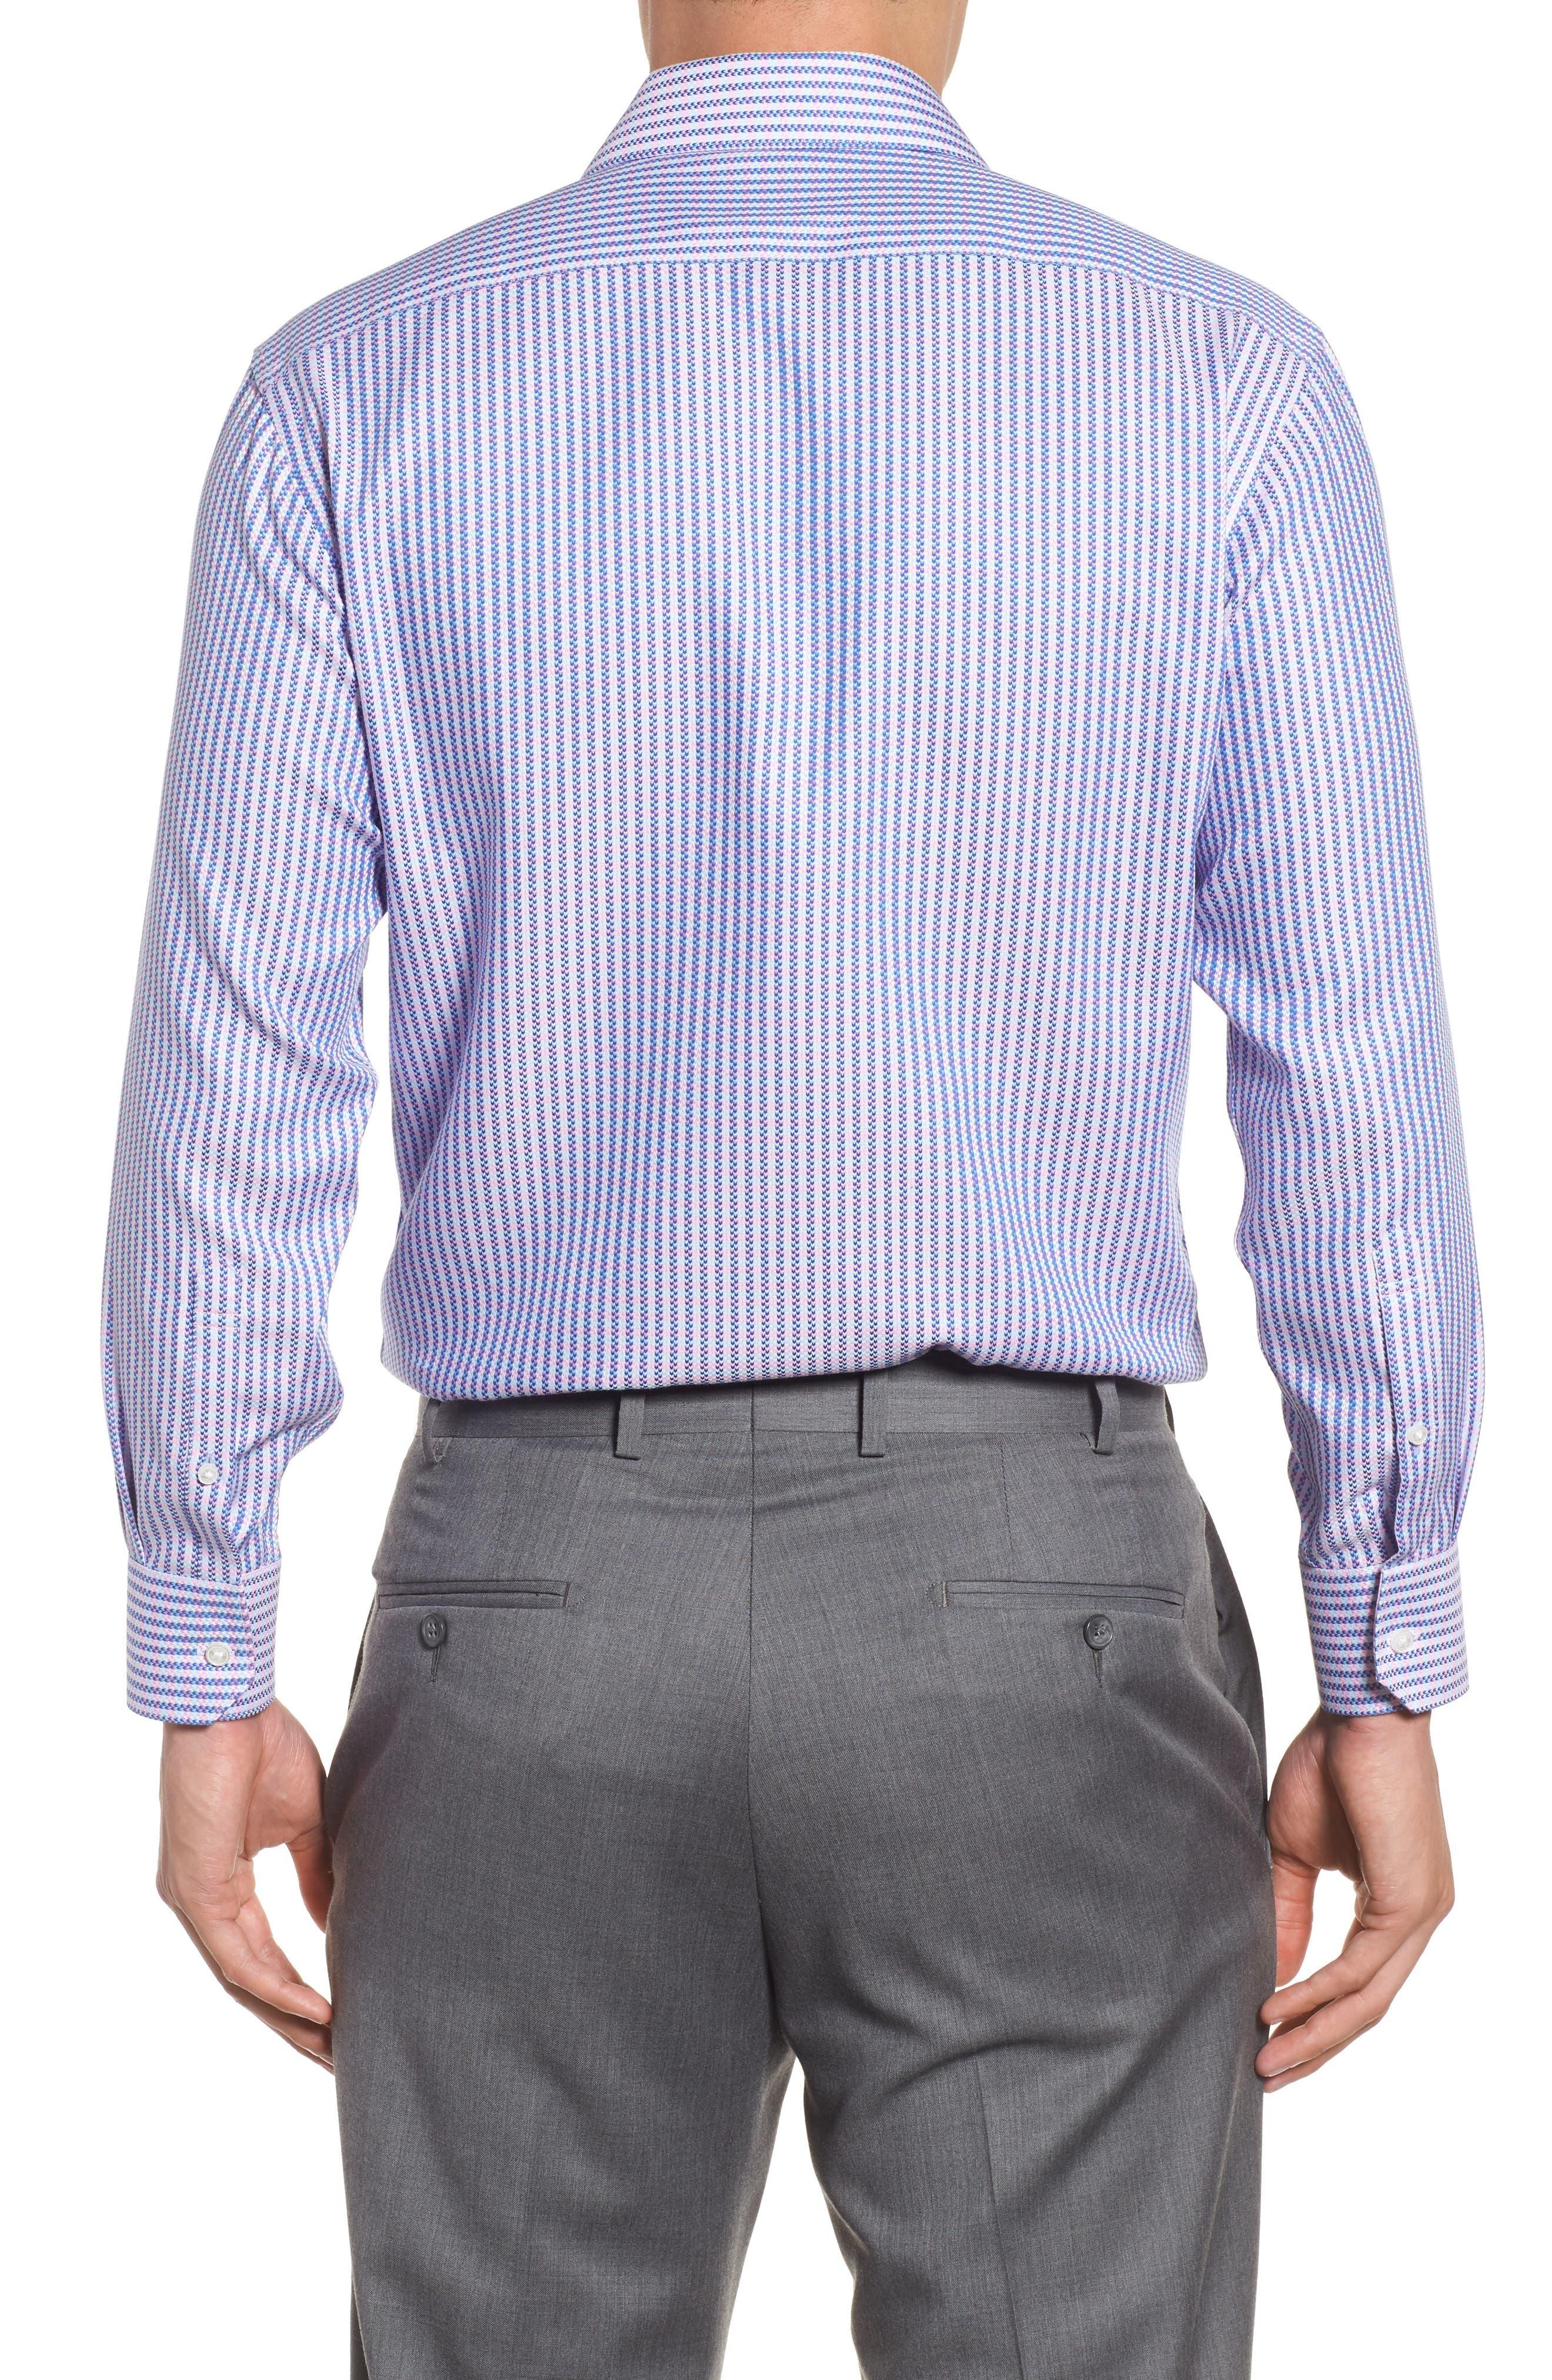 Trim Fit Stripe Dress Shirt,                             Alternate thumbnail 2, color,                             Pink